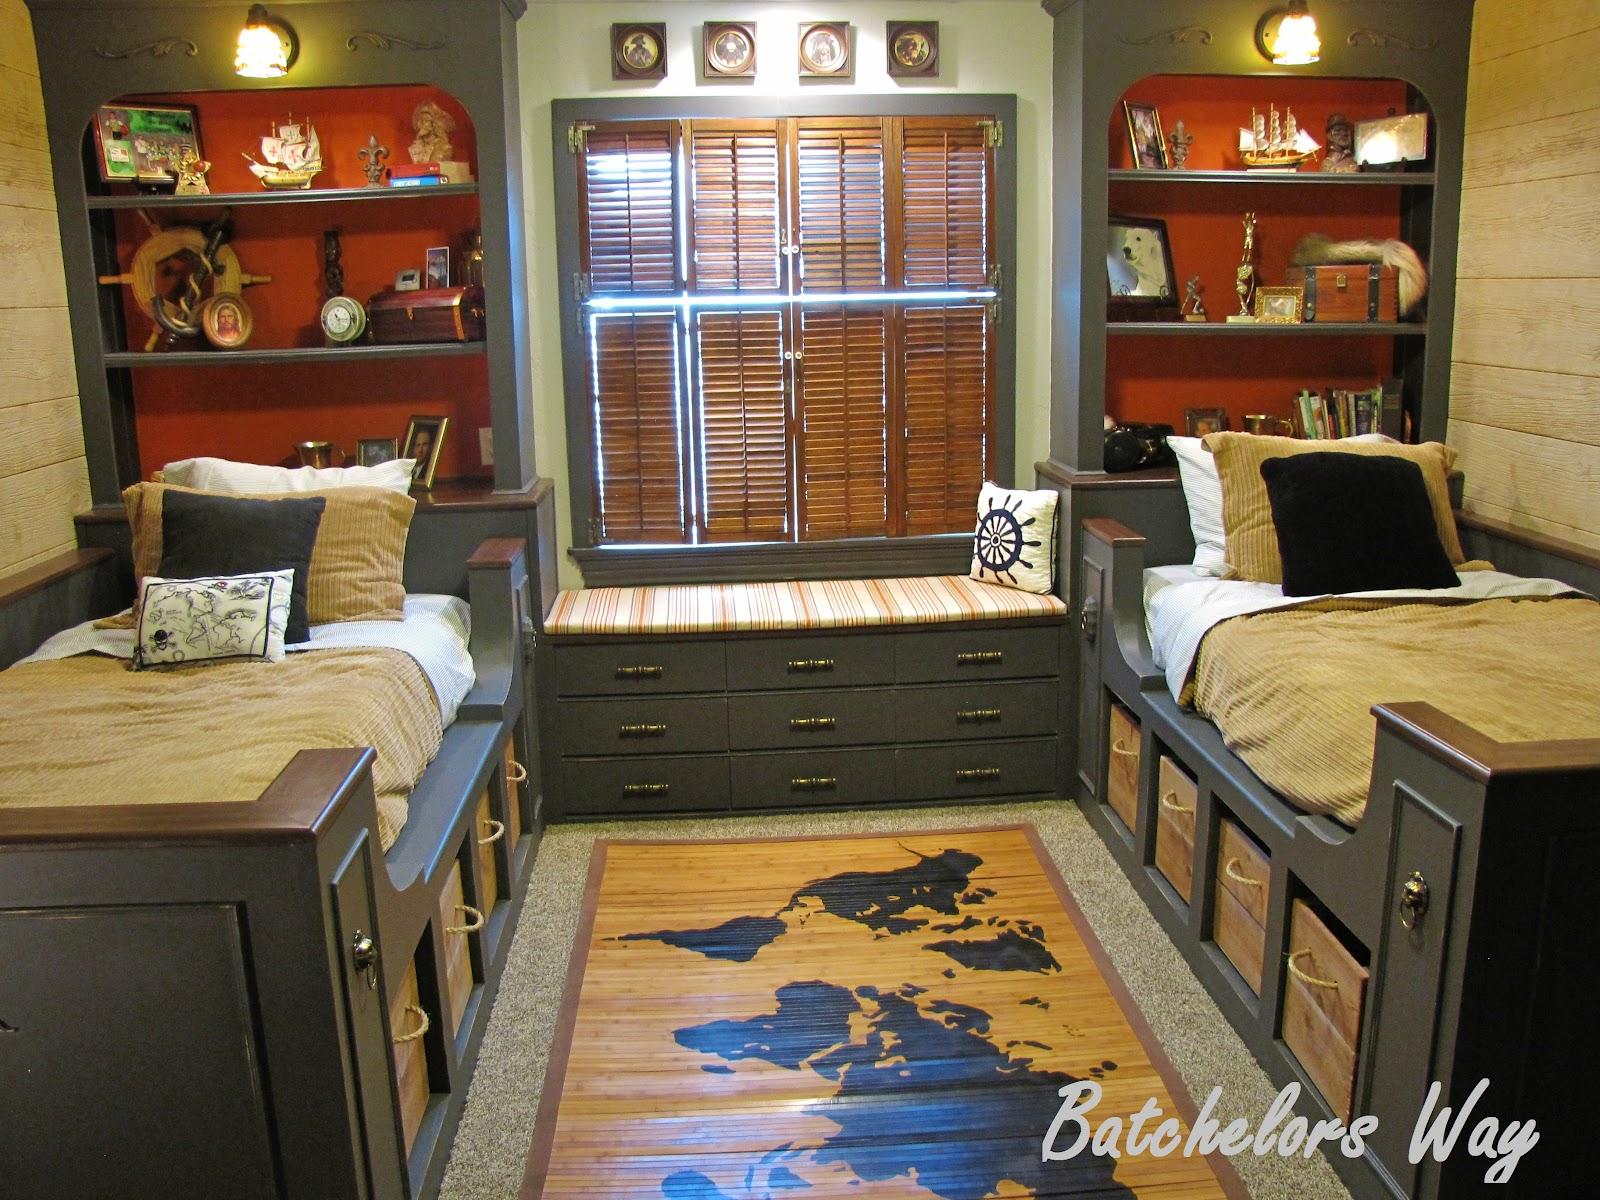 batchelors way: pirate room reveal!!